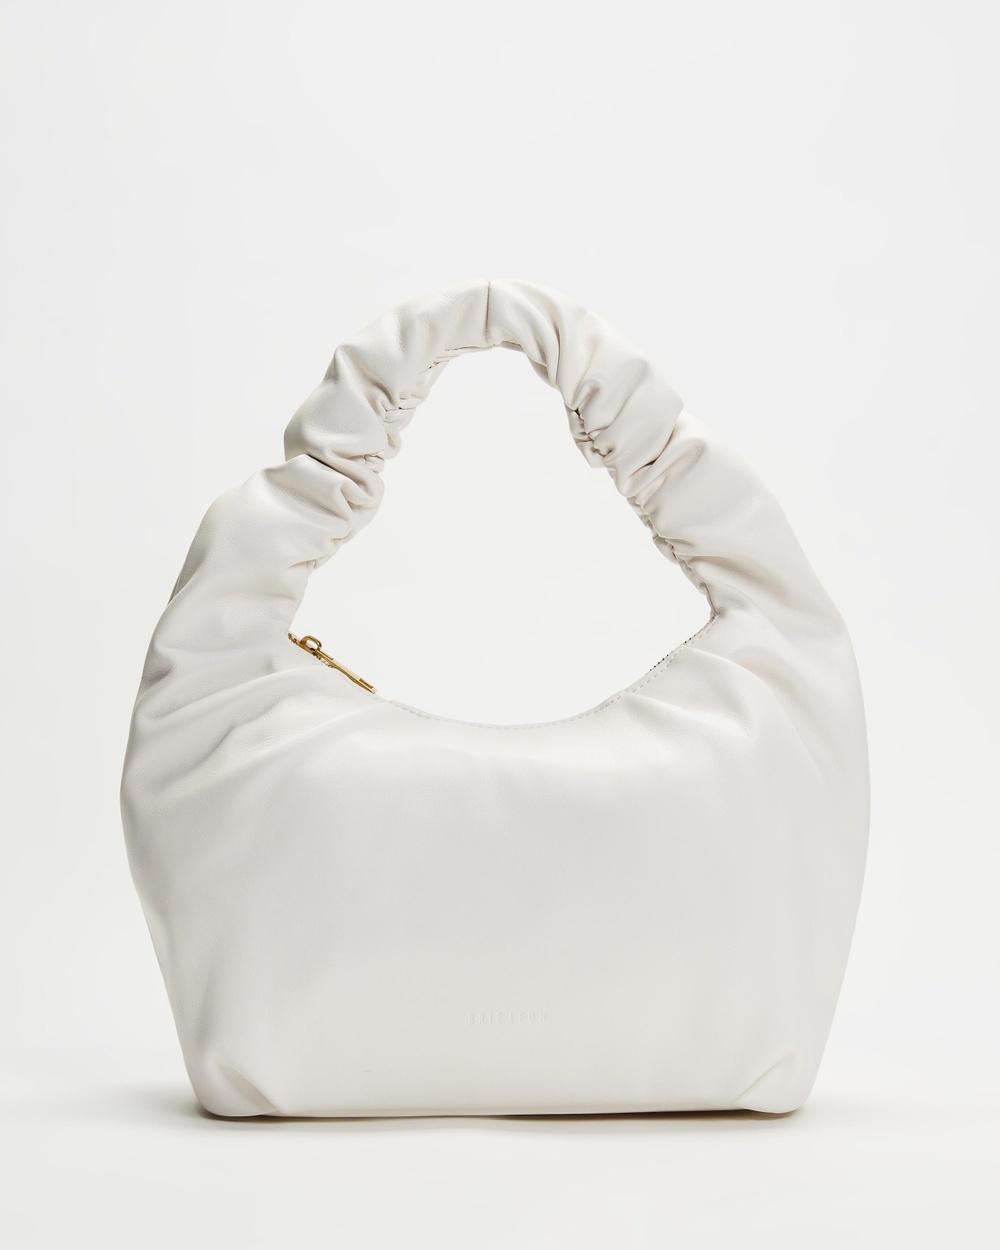 Brie Leon The Fae Bag Handbags White